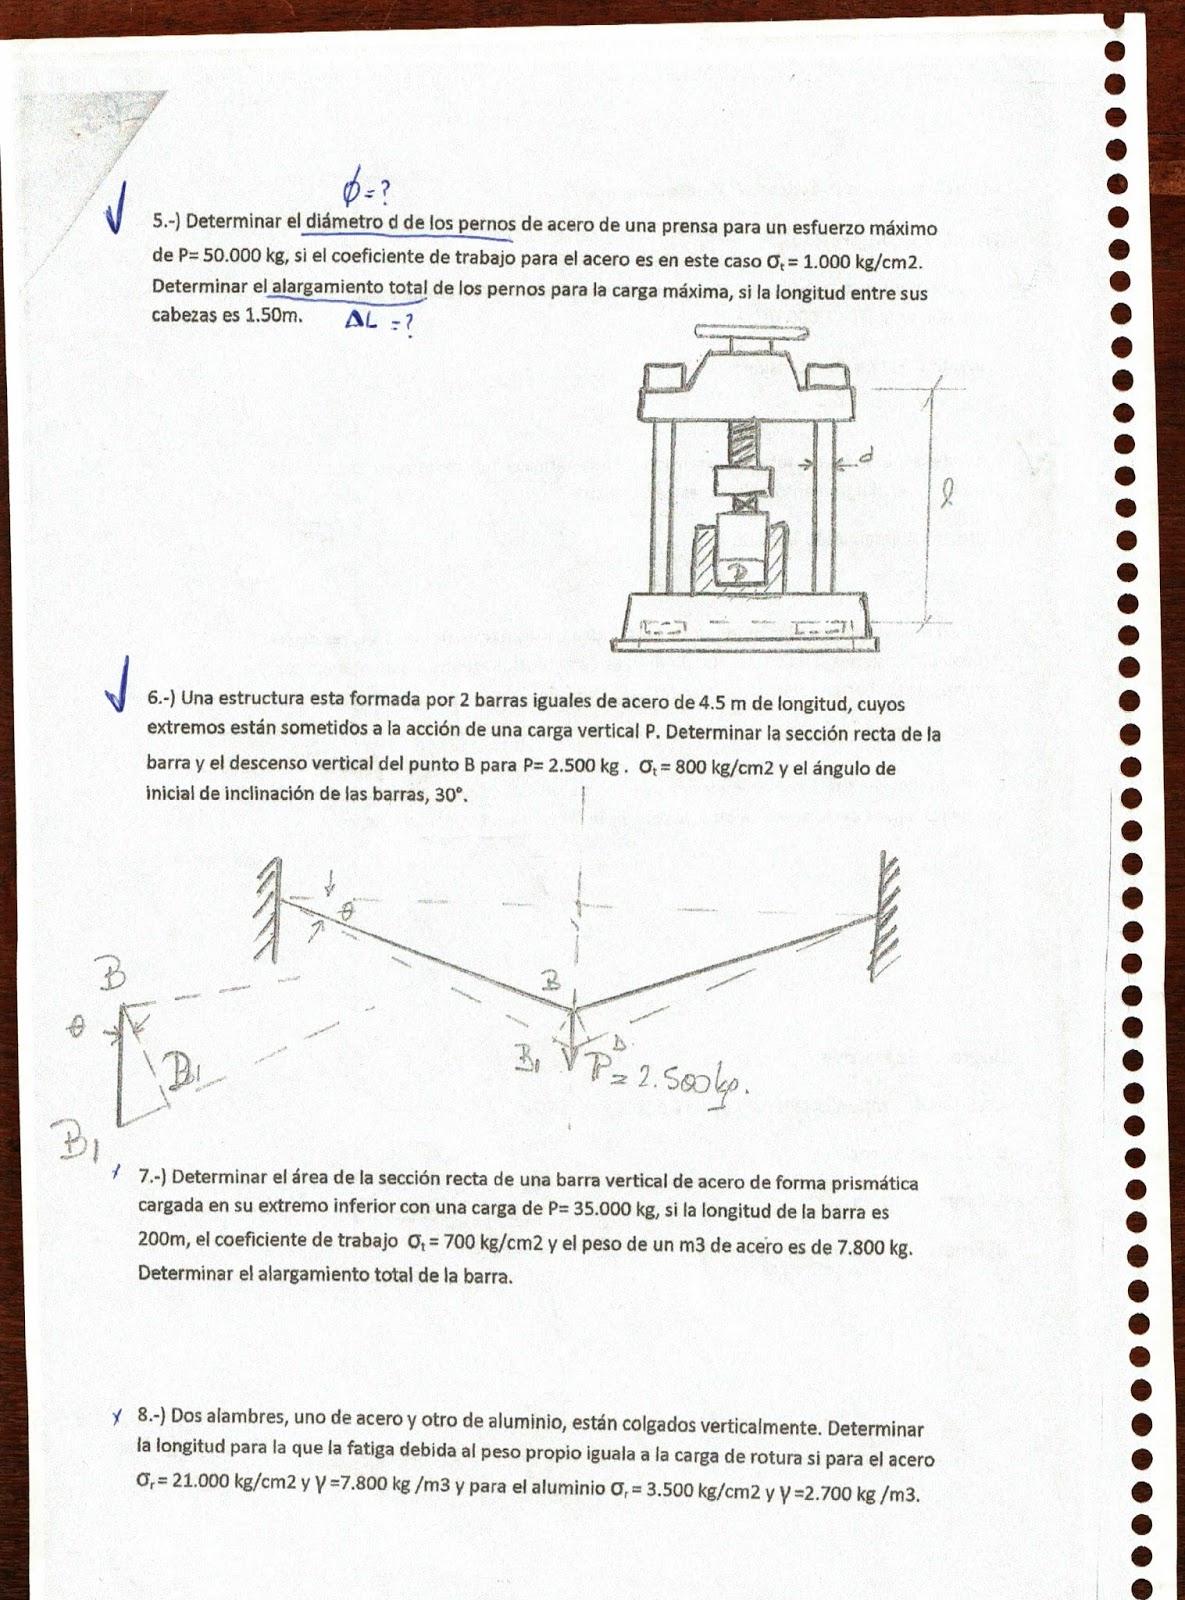 Cursos 15: Ejercicios Resueltos de Mecánica 1